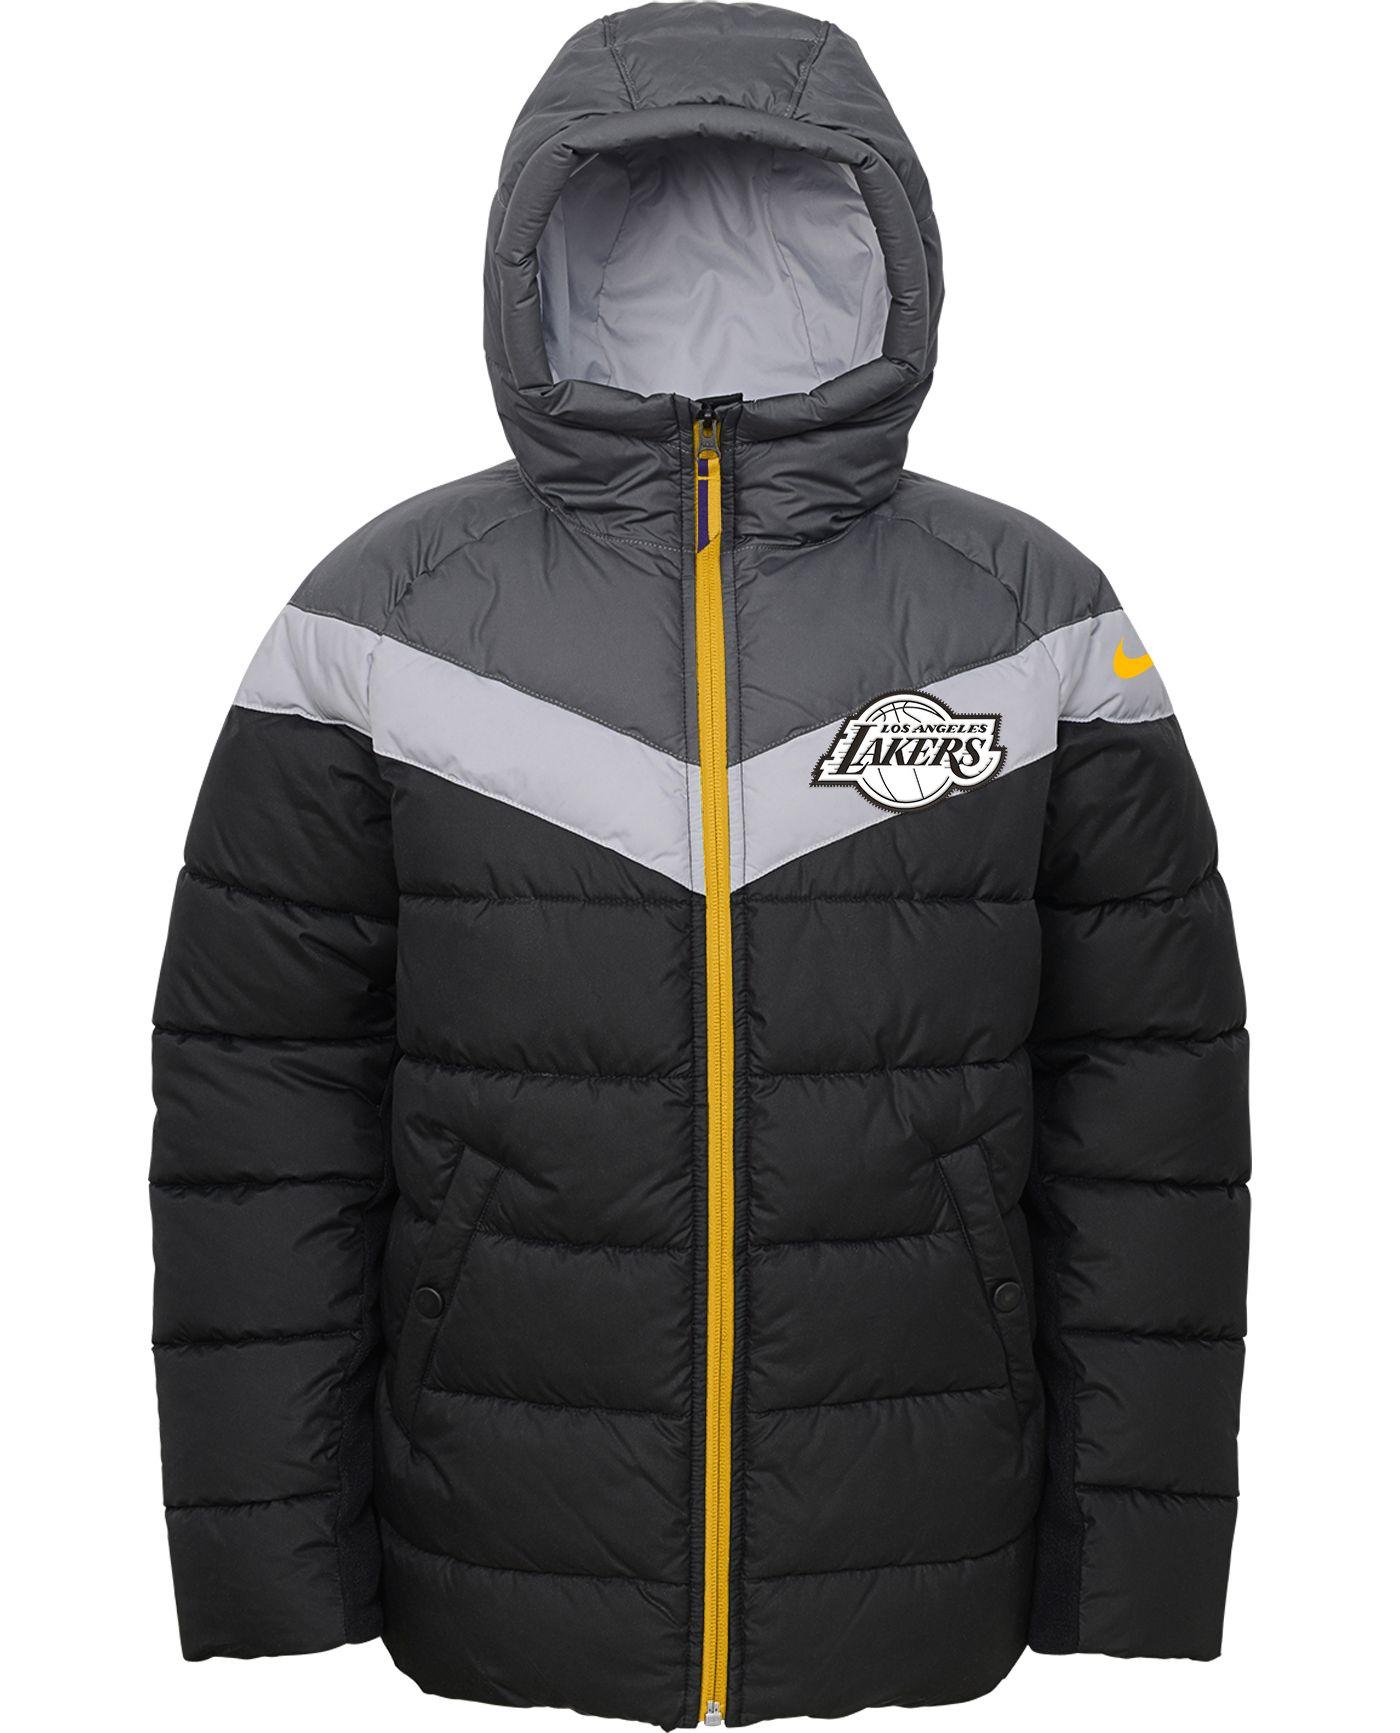 Nike Youth Los Angeles Lakers Puffer Full-Zip Jacket